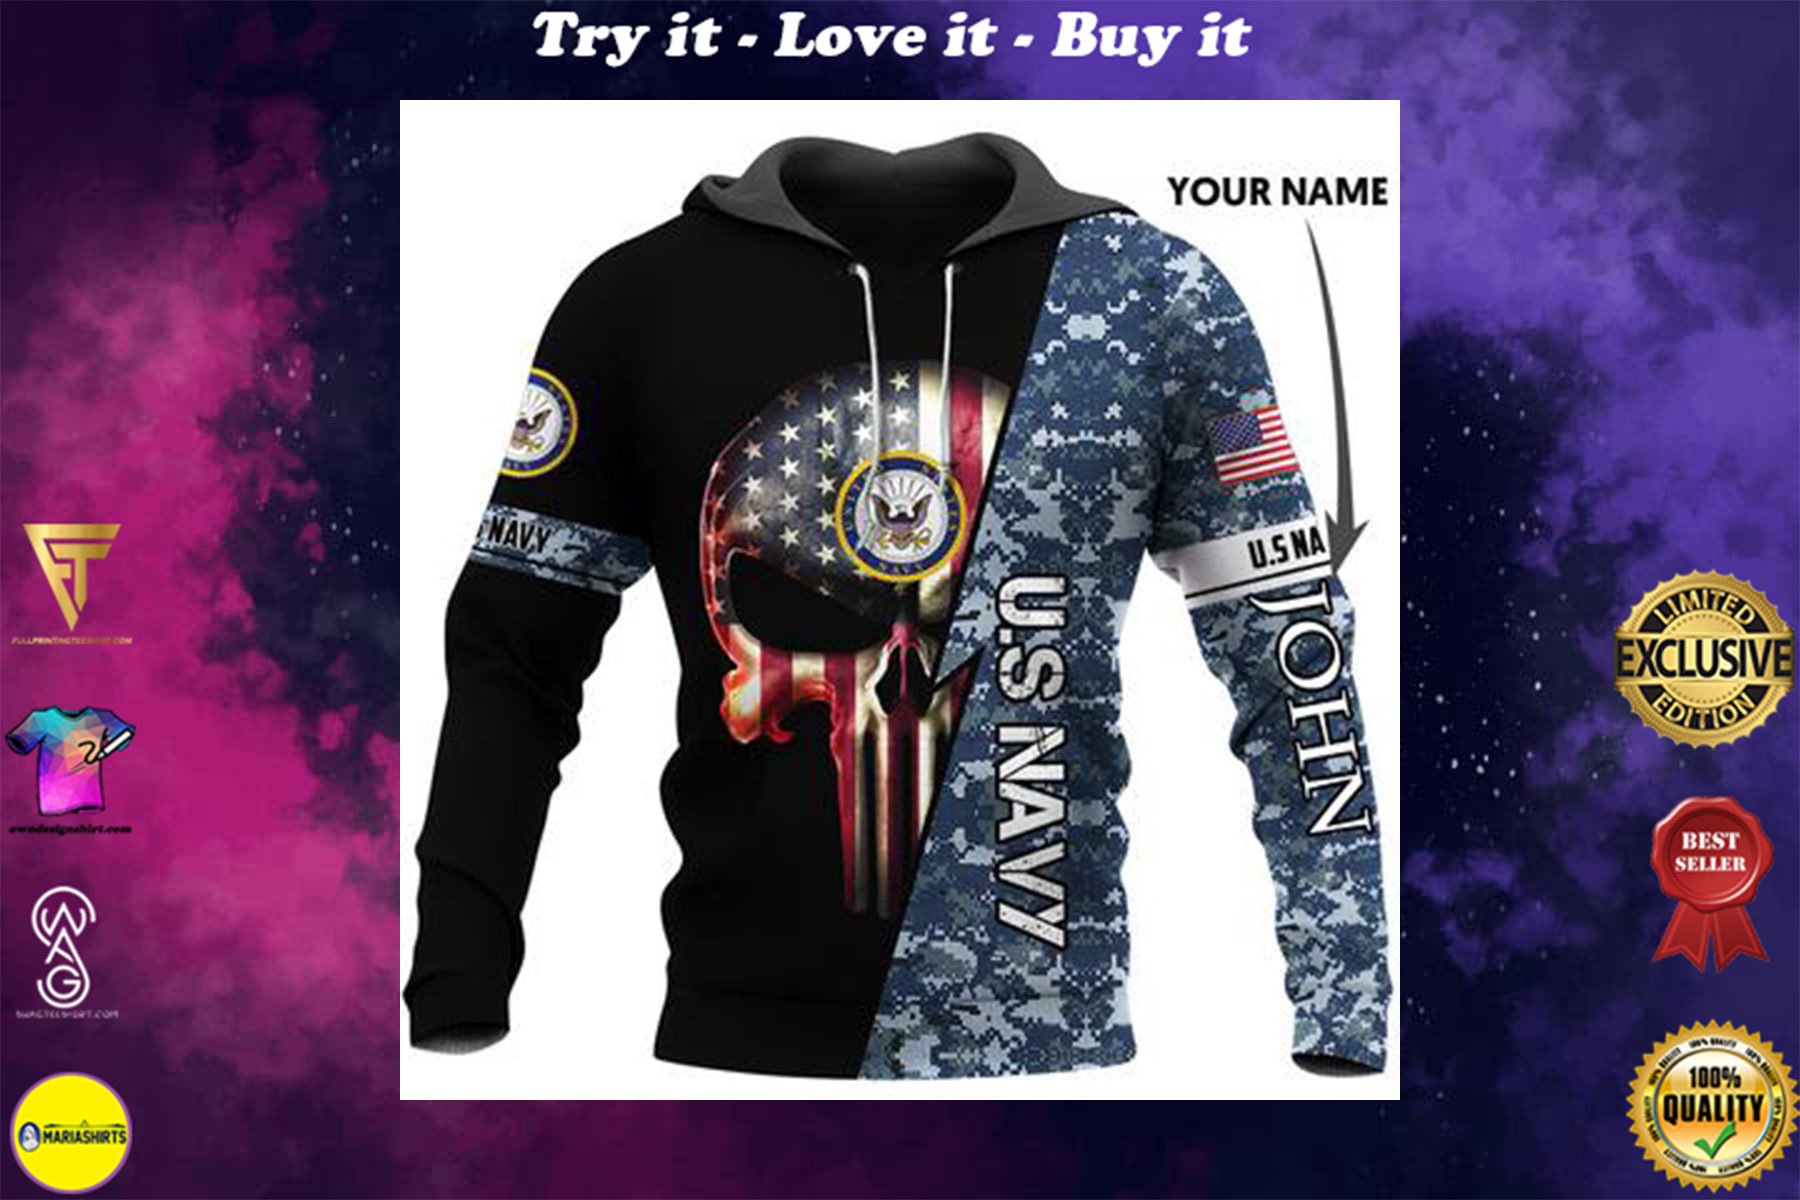 [highest selling] custom name us navy skull american flag camo full over printed shirt - maria